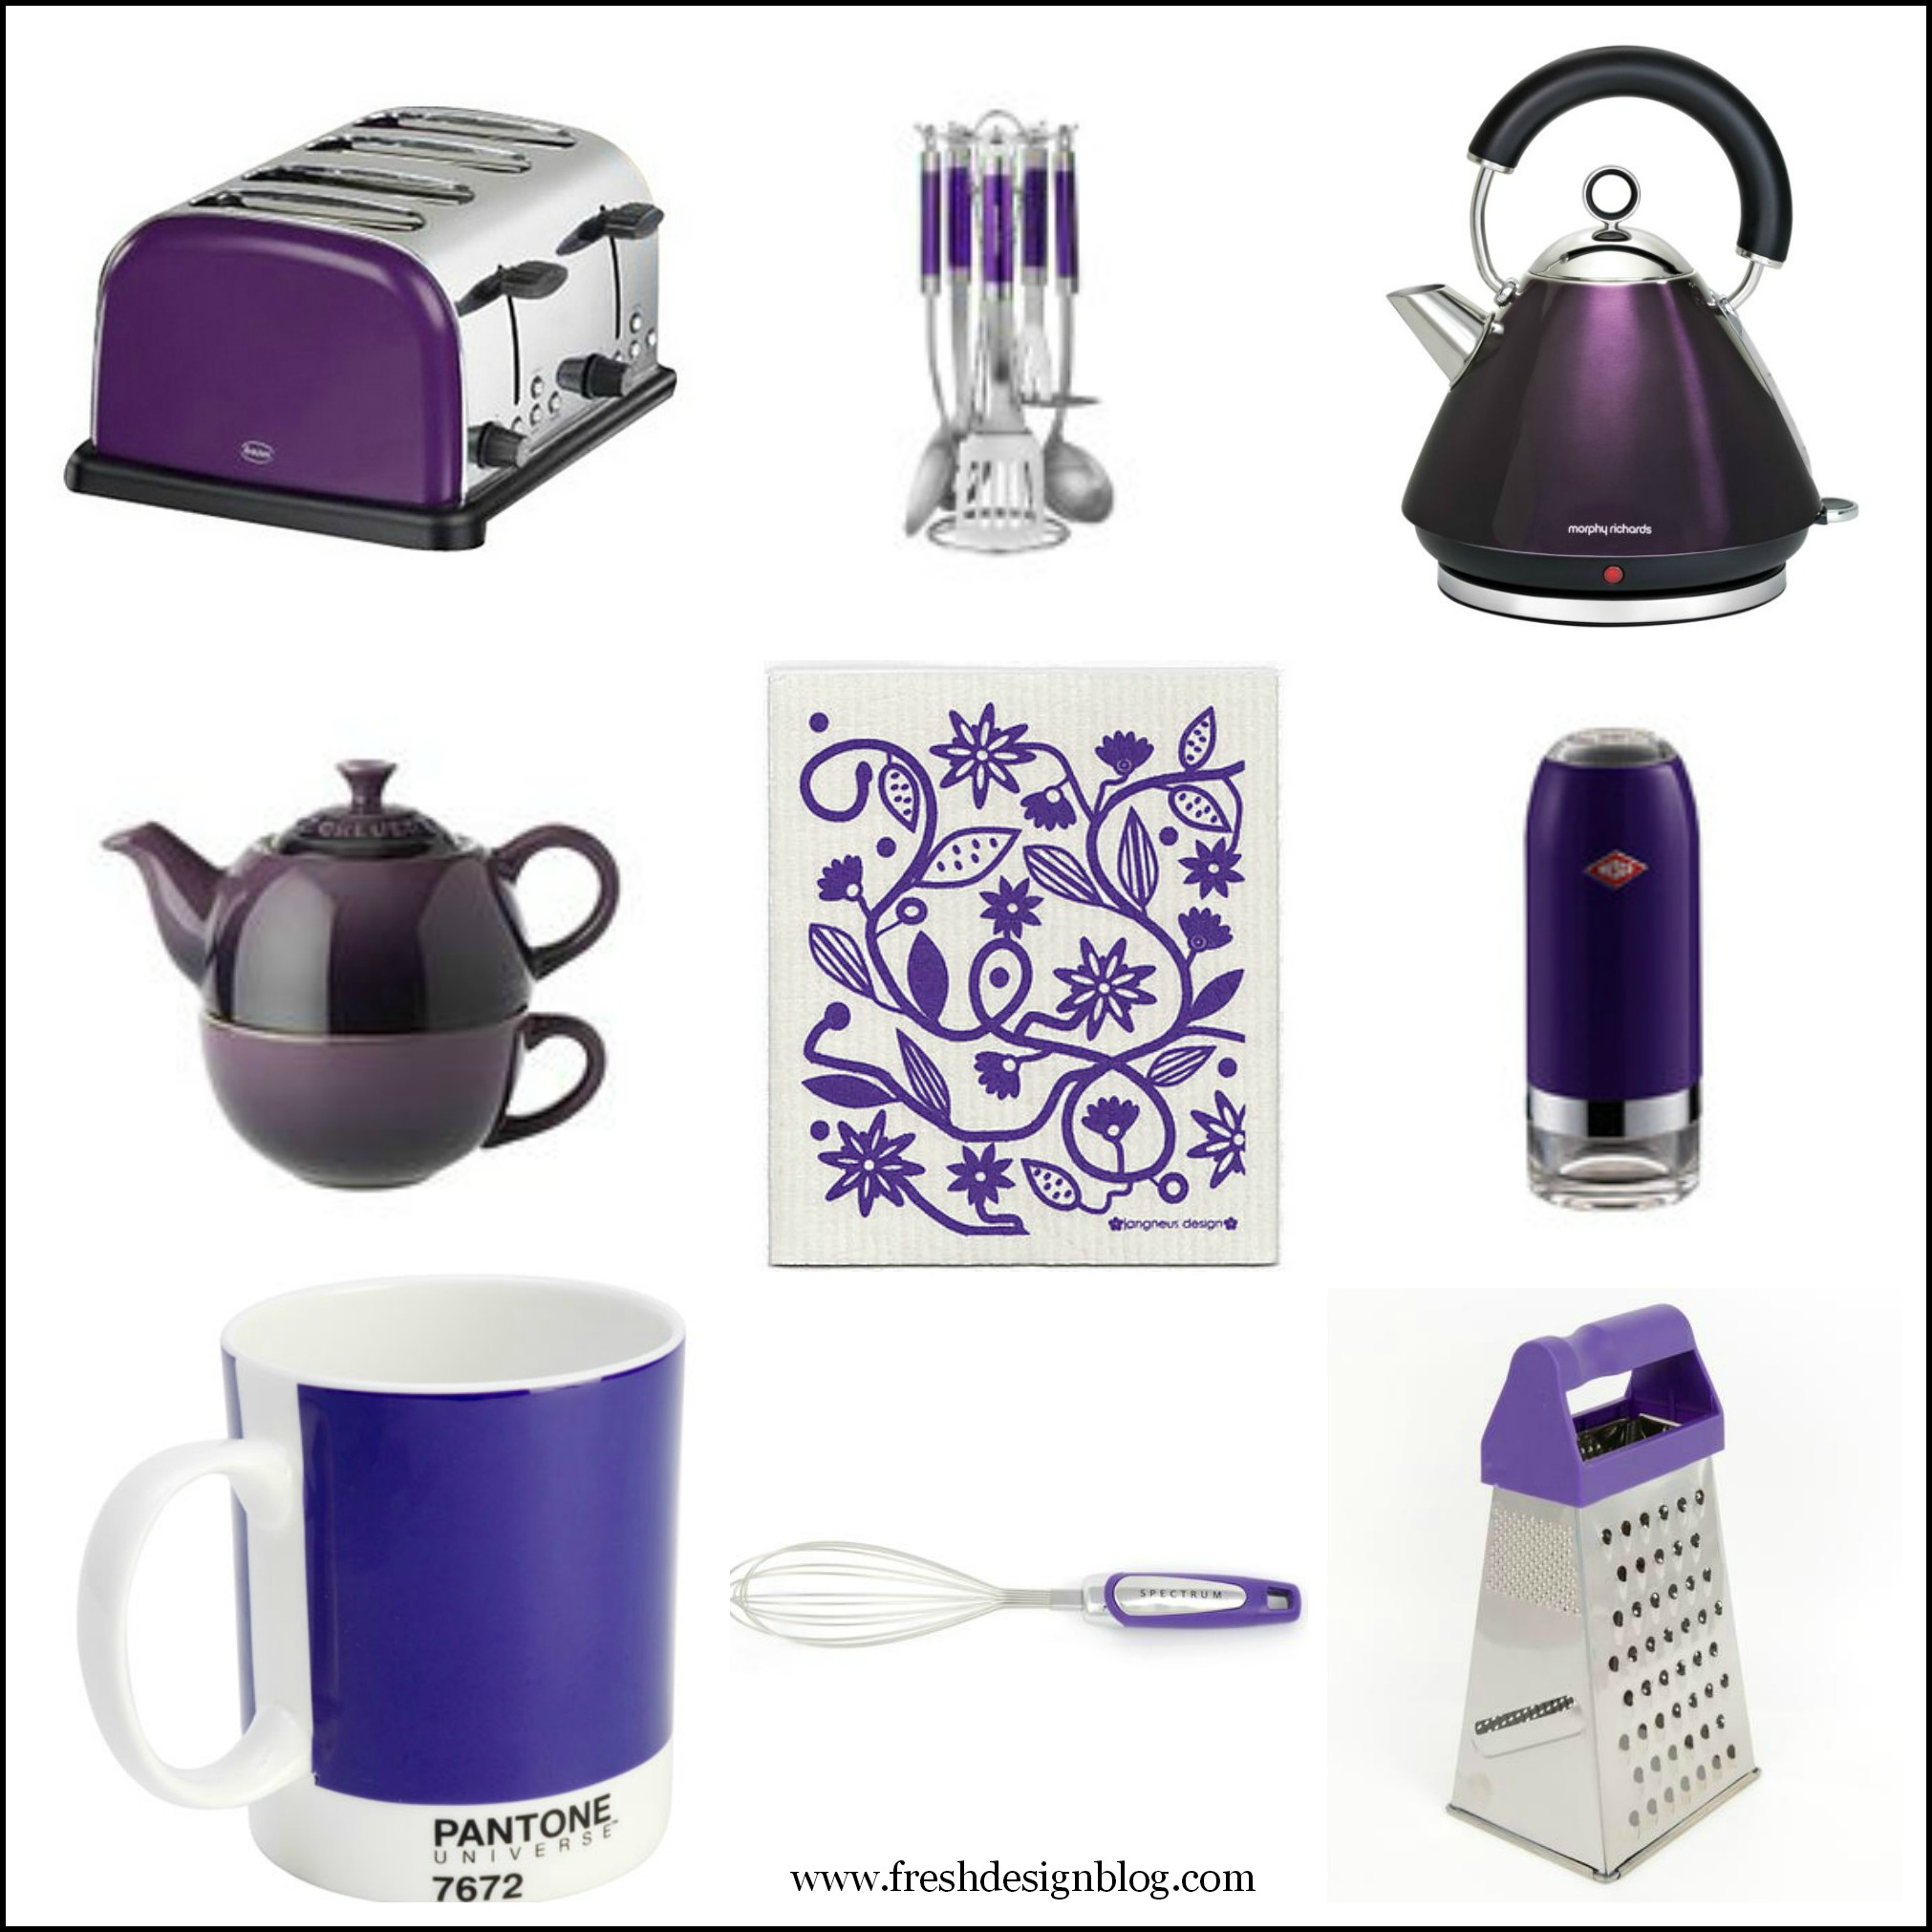 Kitchen Kit Purple Themed Kitchen Accessories  Fresh. Flexsteel Living Room Groups. Odd Shaped Living Room Furniture Arrangement. Painting Ideas For Living Room With Black Furniture. Living Room Sets Furniture Stores